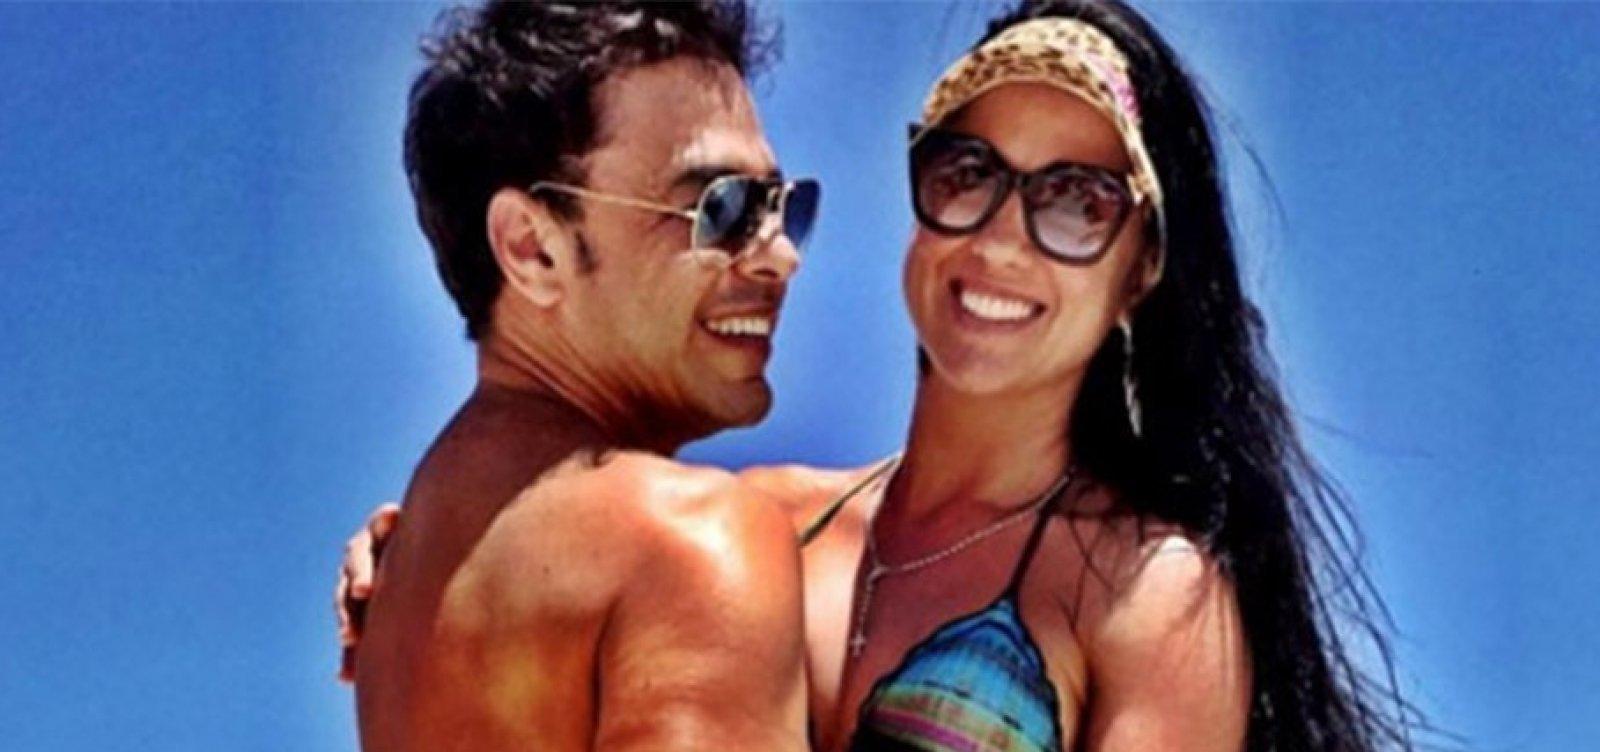 Zezé di Camargo e Graciele Lacerda marcam data de casamento, diz jornalista